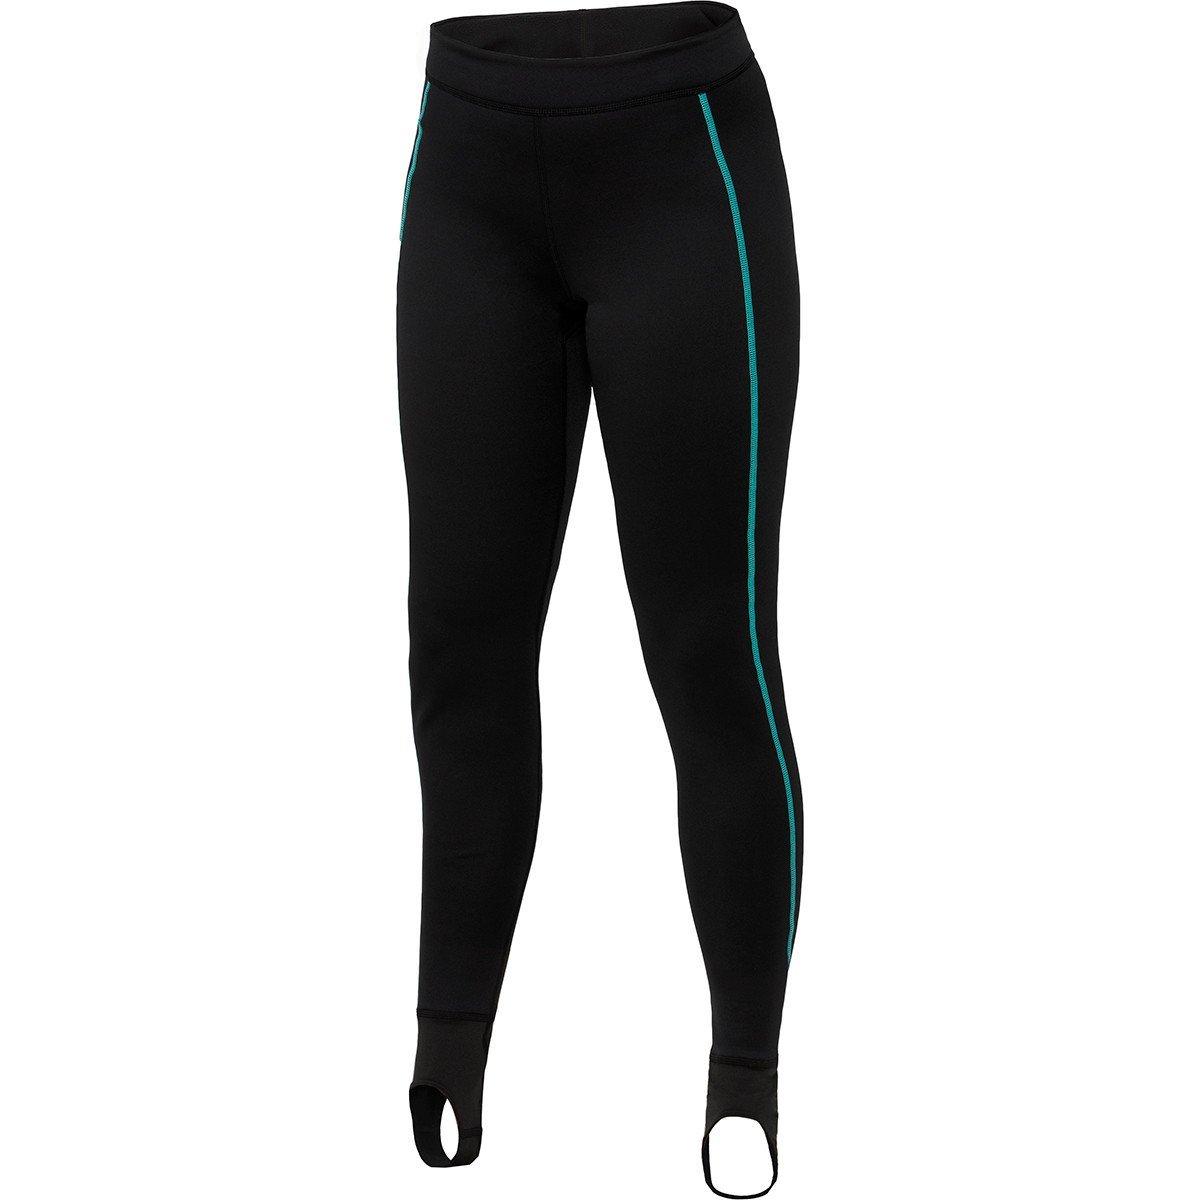 Bare Ultrawarmth Base Layer Womens's Pant